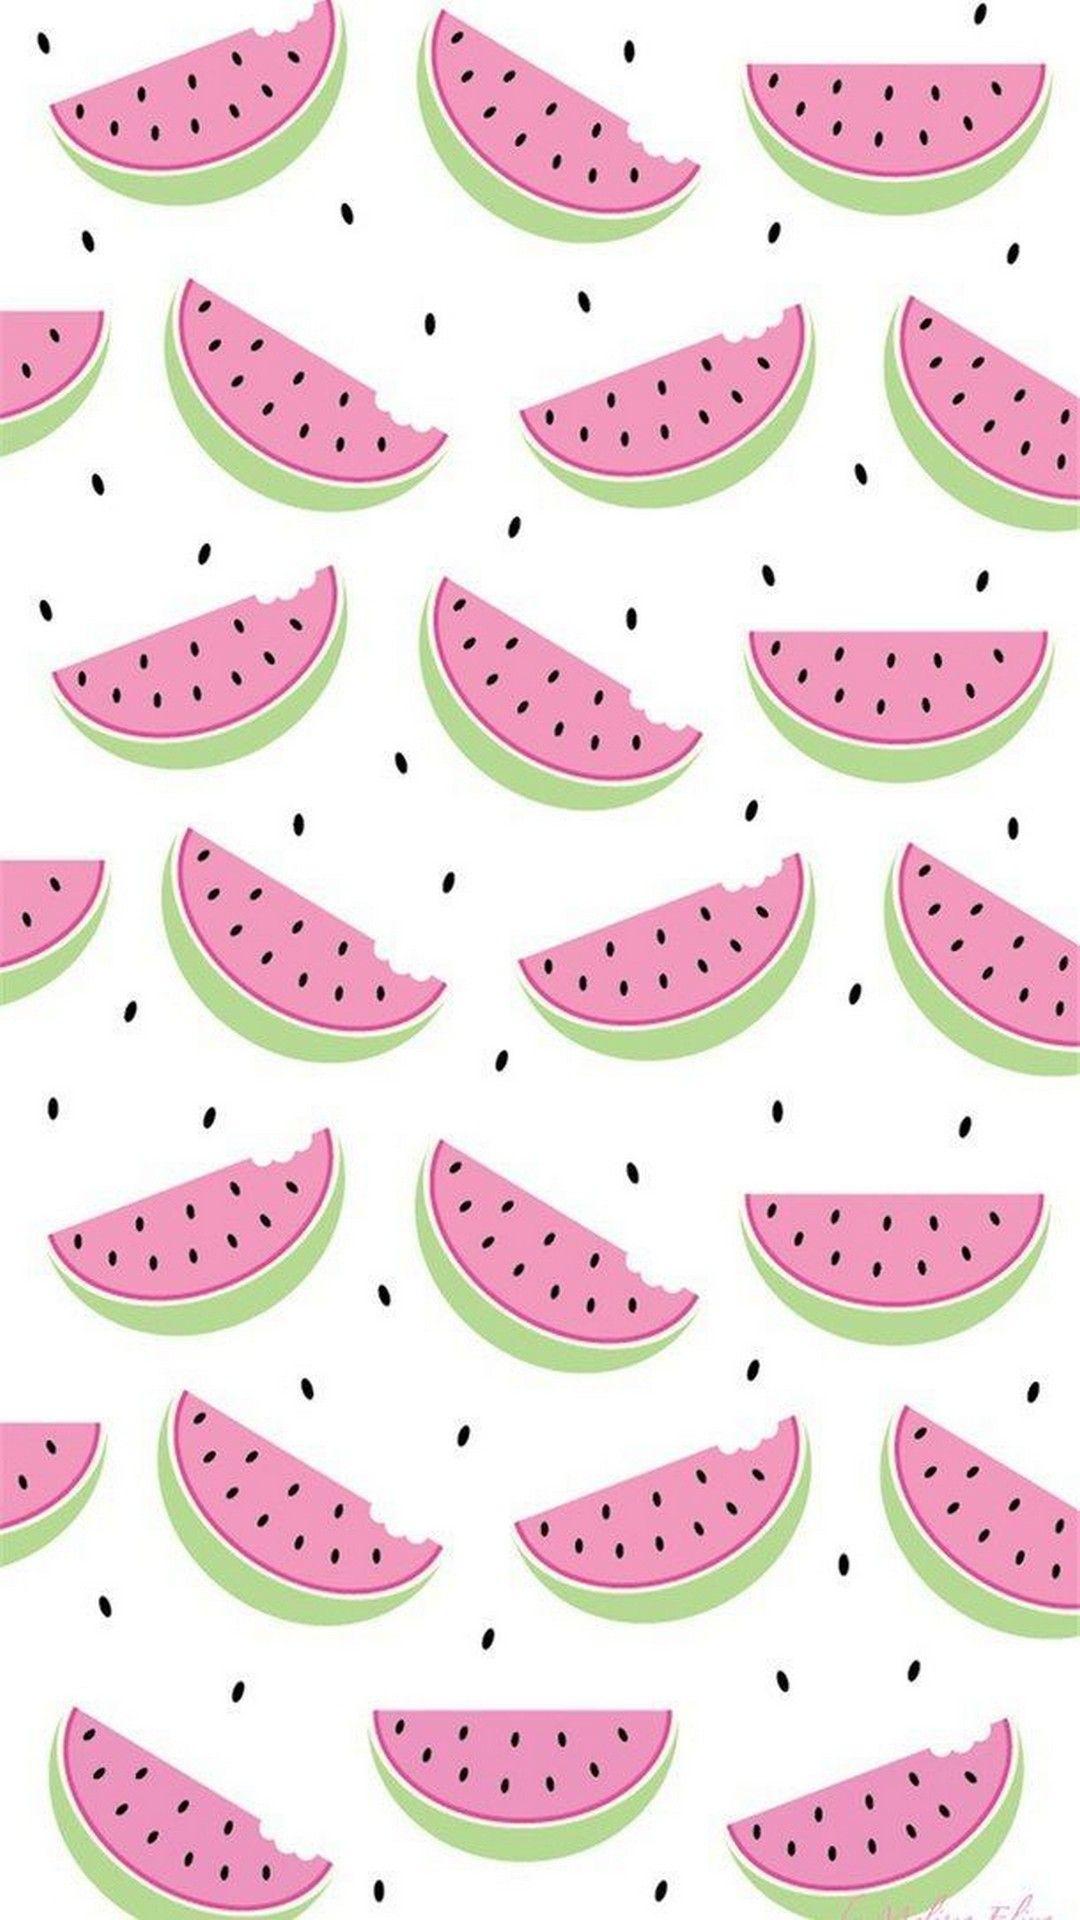 Watermelon Cute Girly Wallpaper Iphone Iphone Wallpaper Girly